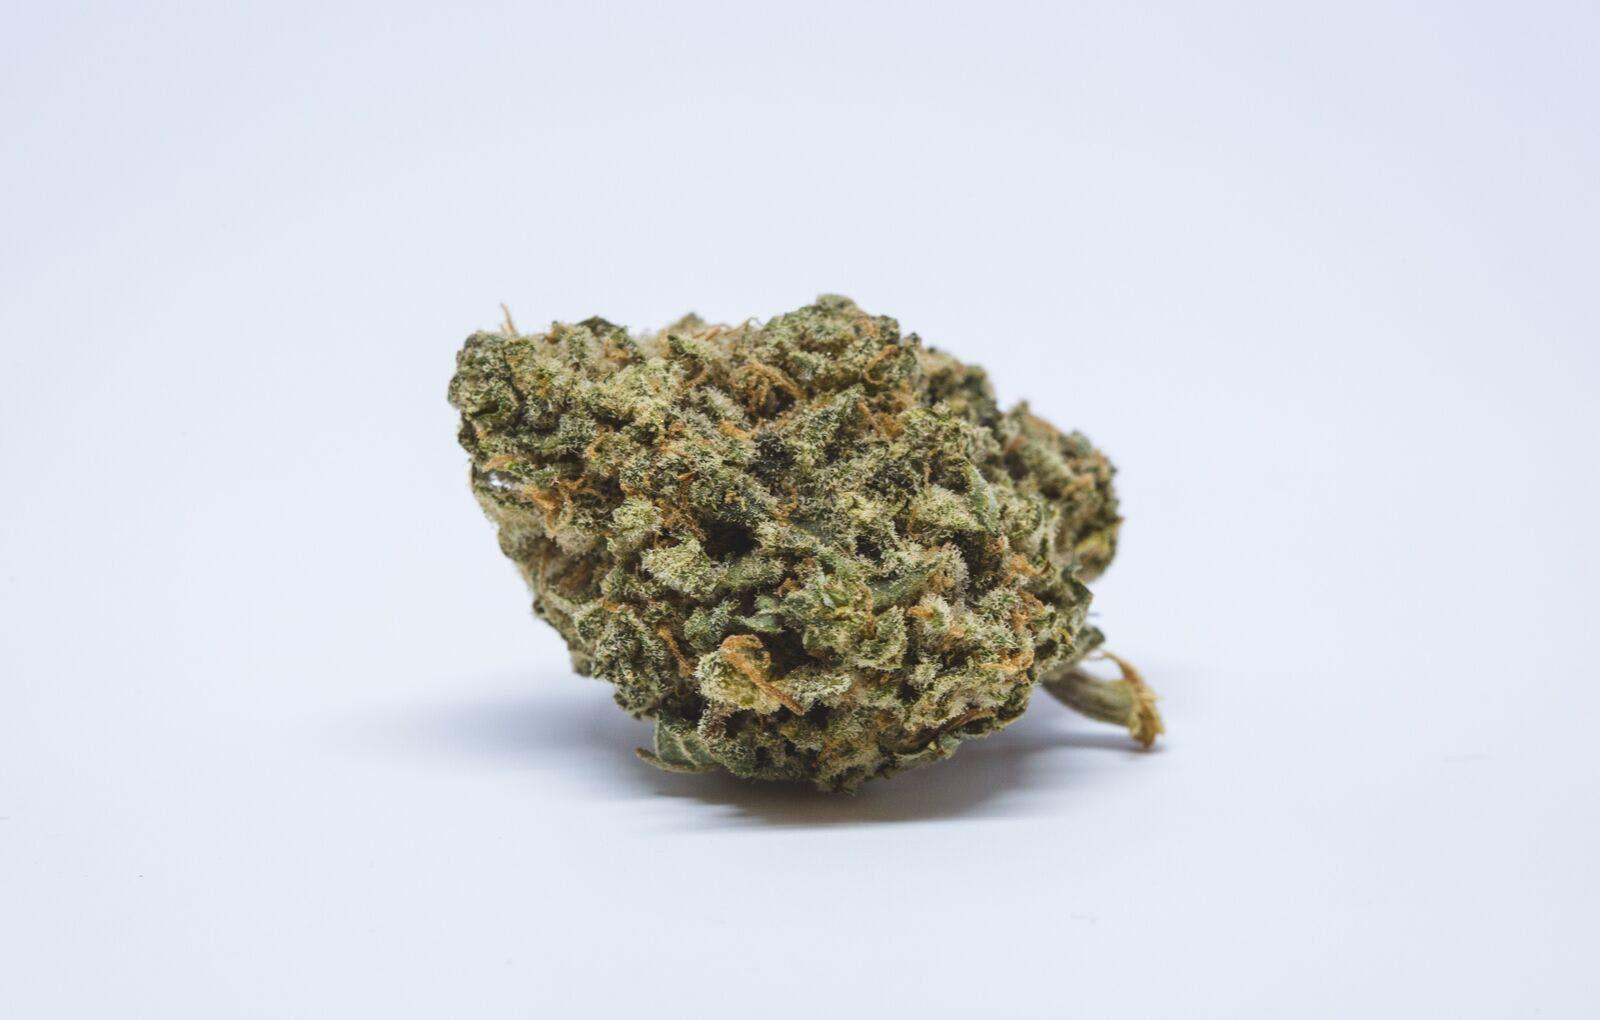 Tora Bora Weed; Tora Bora Cannabis Strain; Tora Bora Indica Marijuana Strain